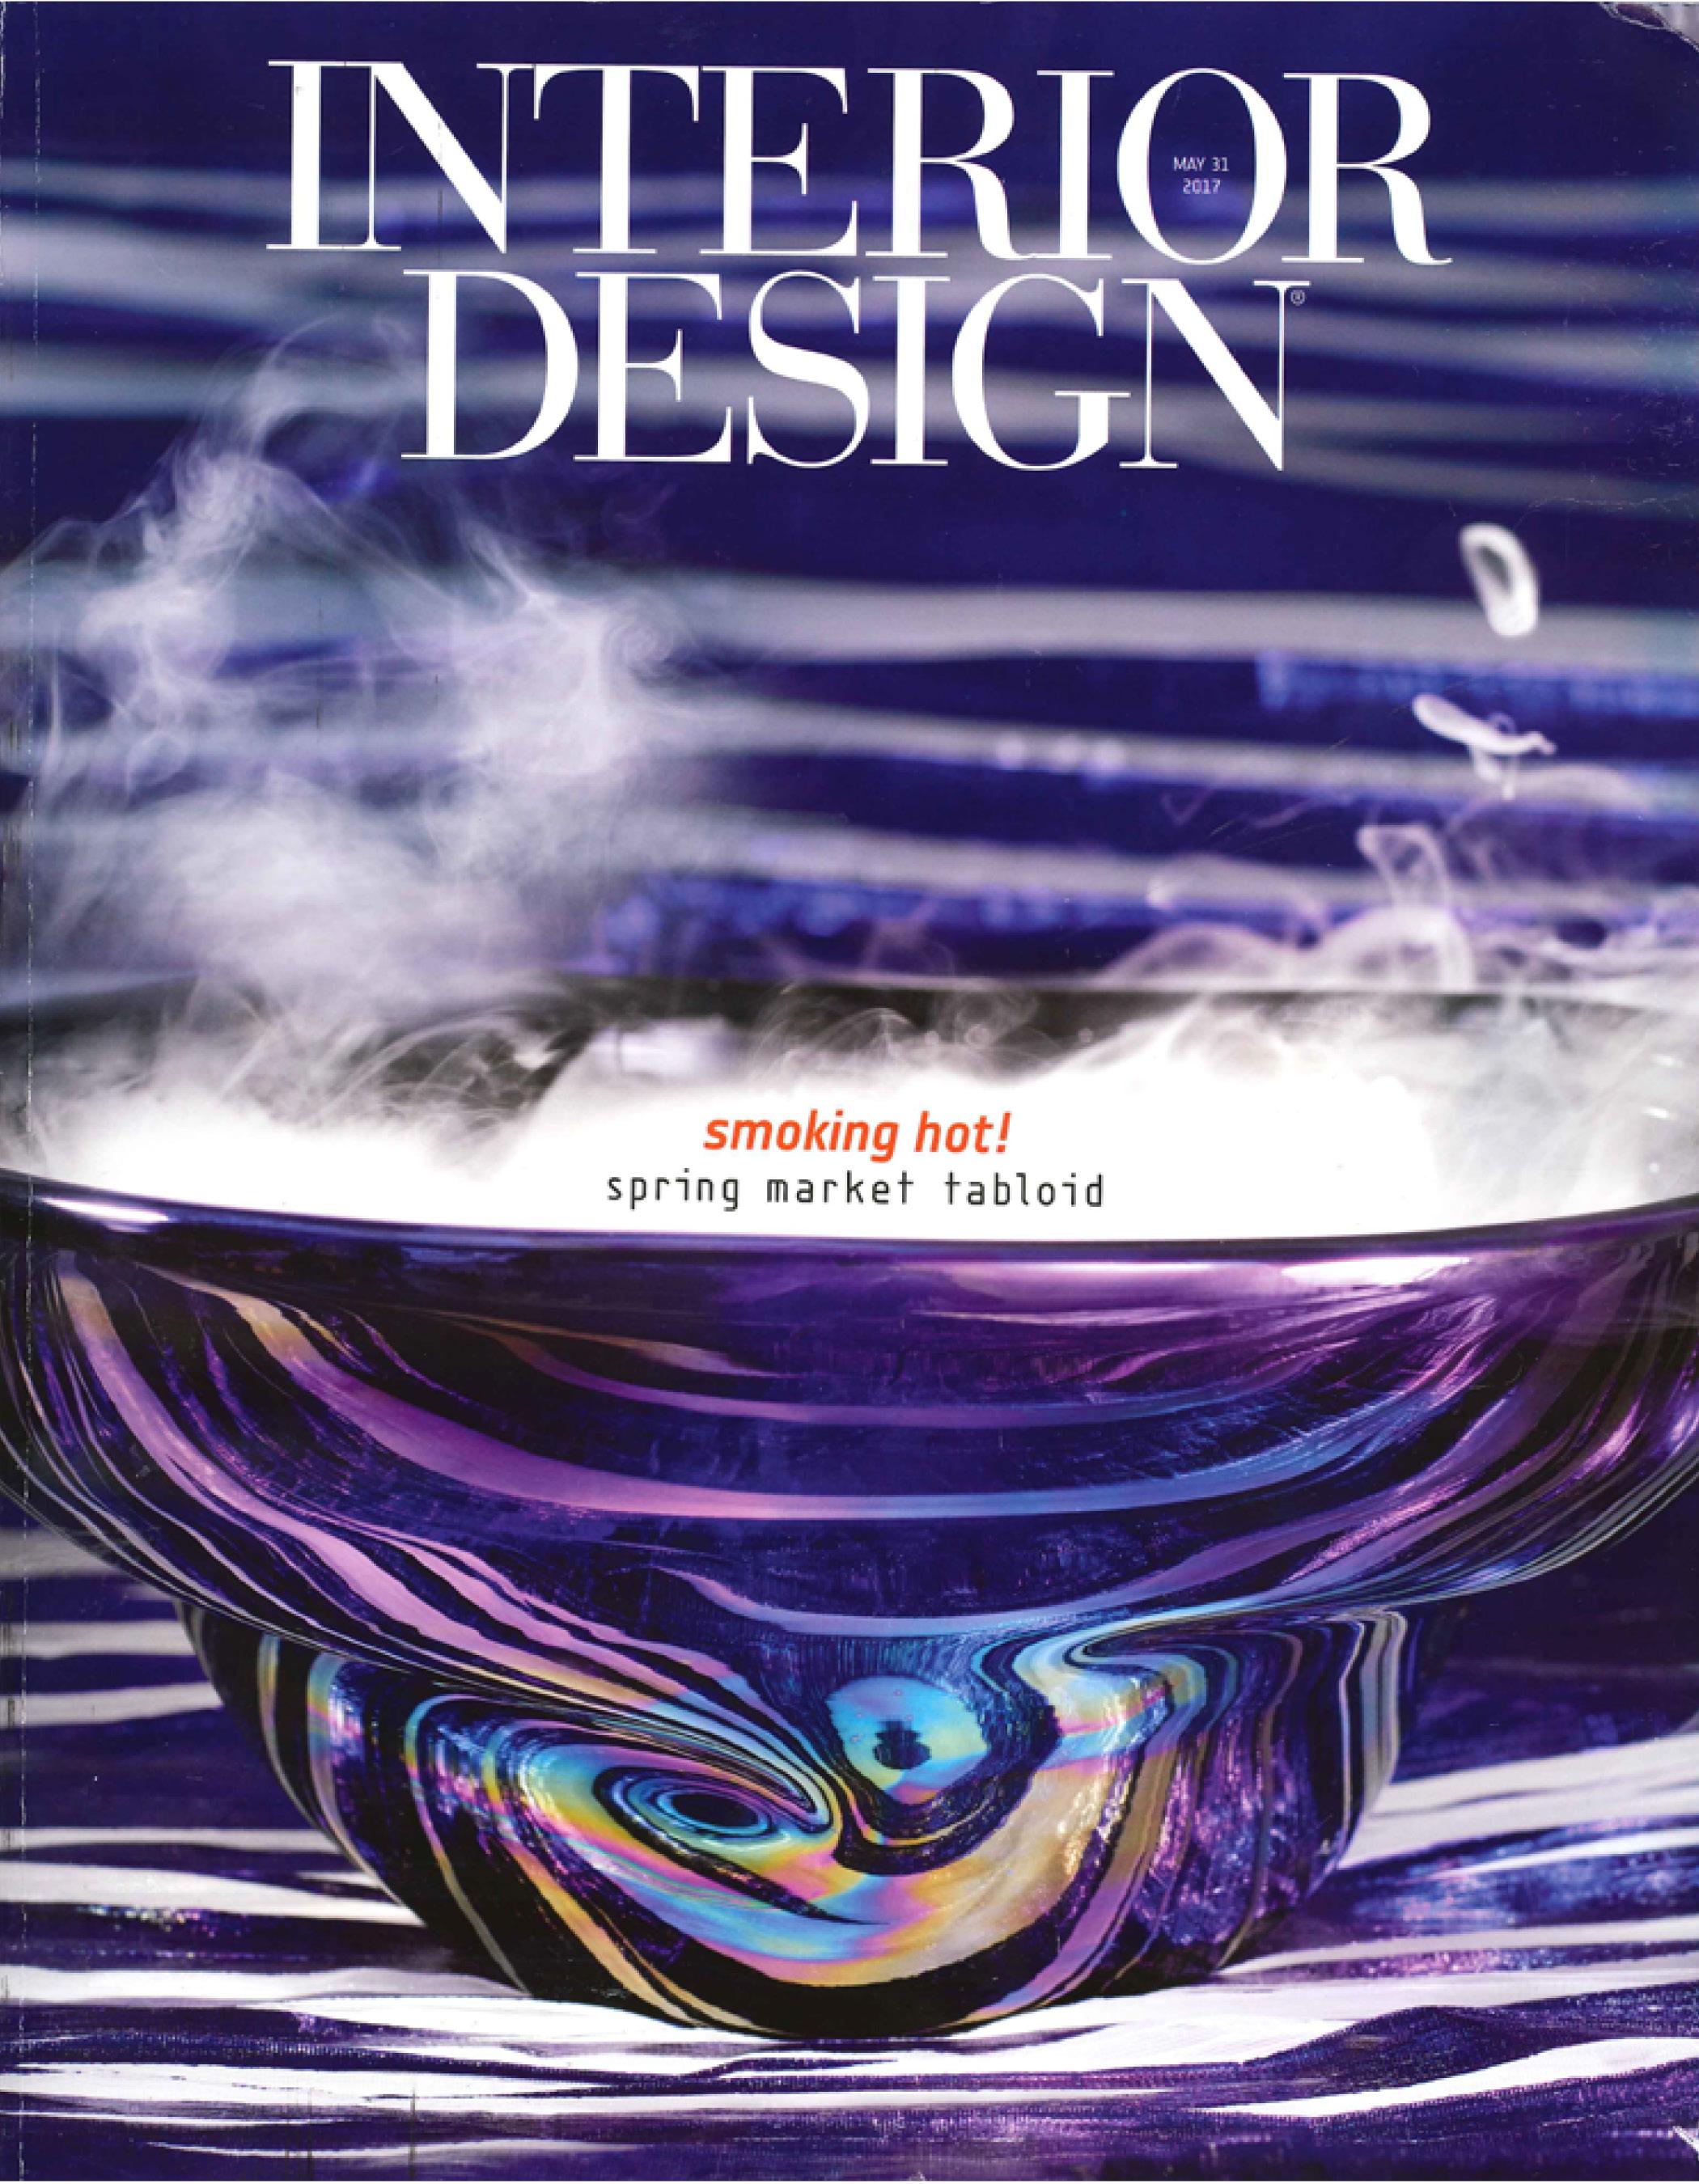 interior-design-cover-2017.jpg